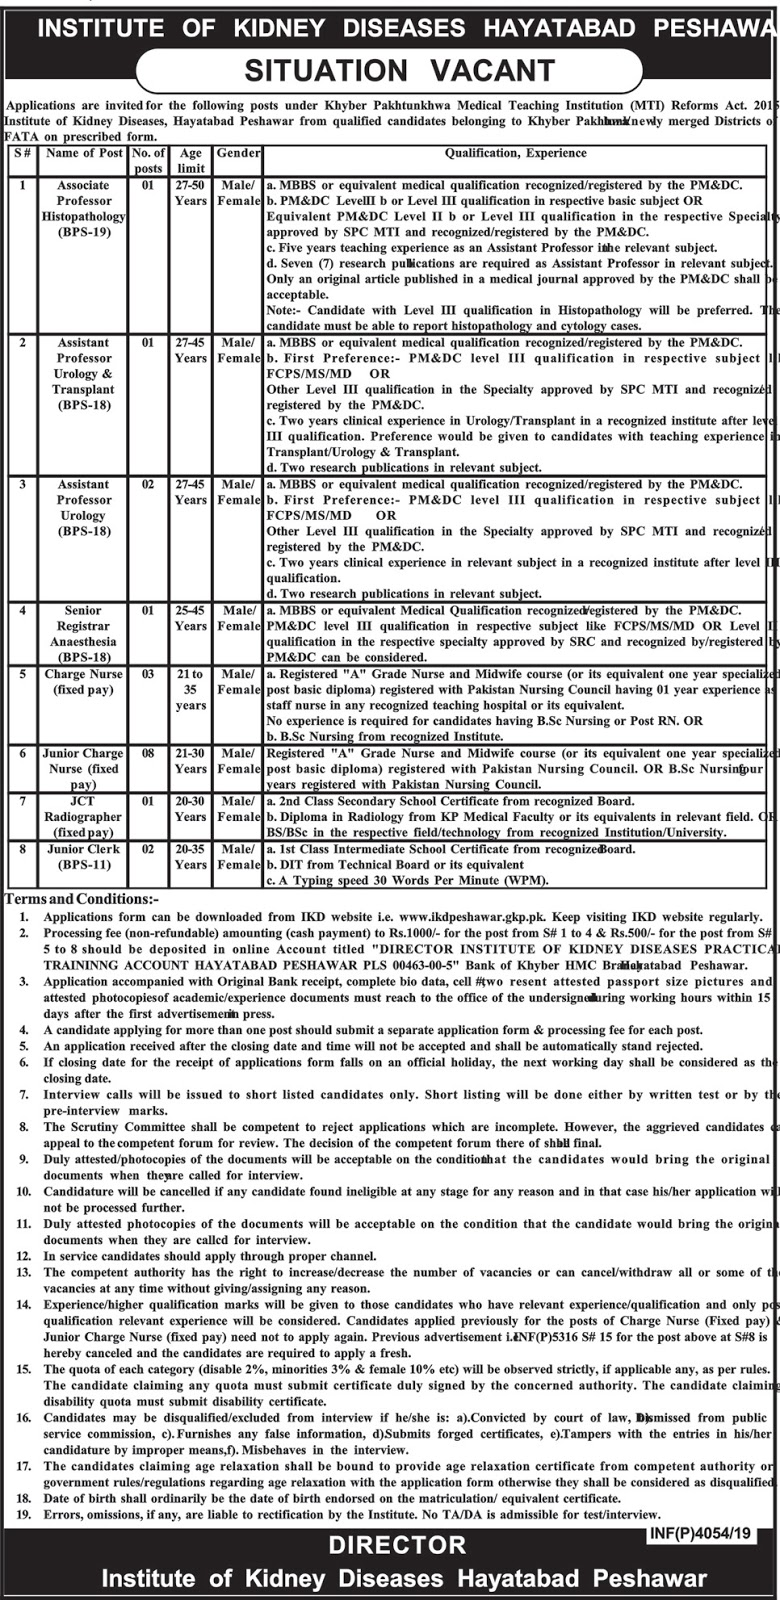 Institute of Kidney Diseases Hayatabad Peshawar Jobs 2019